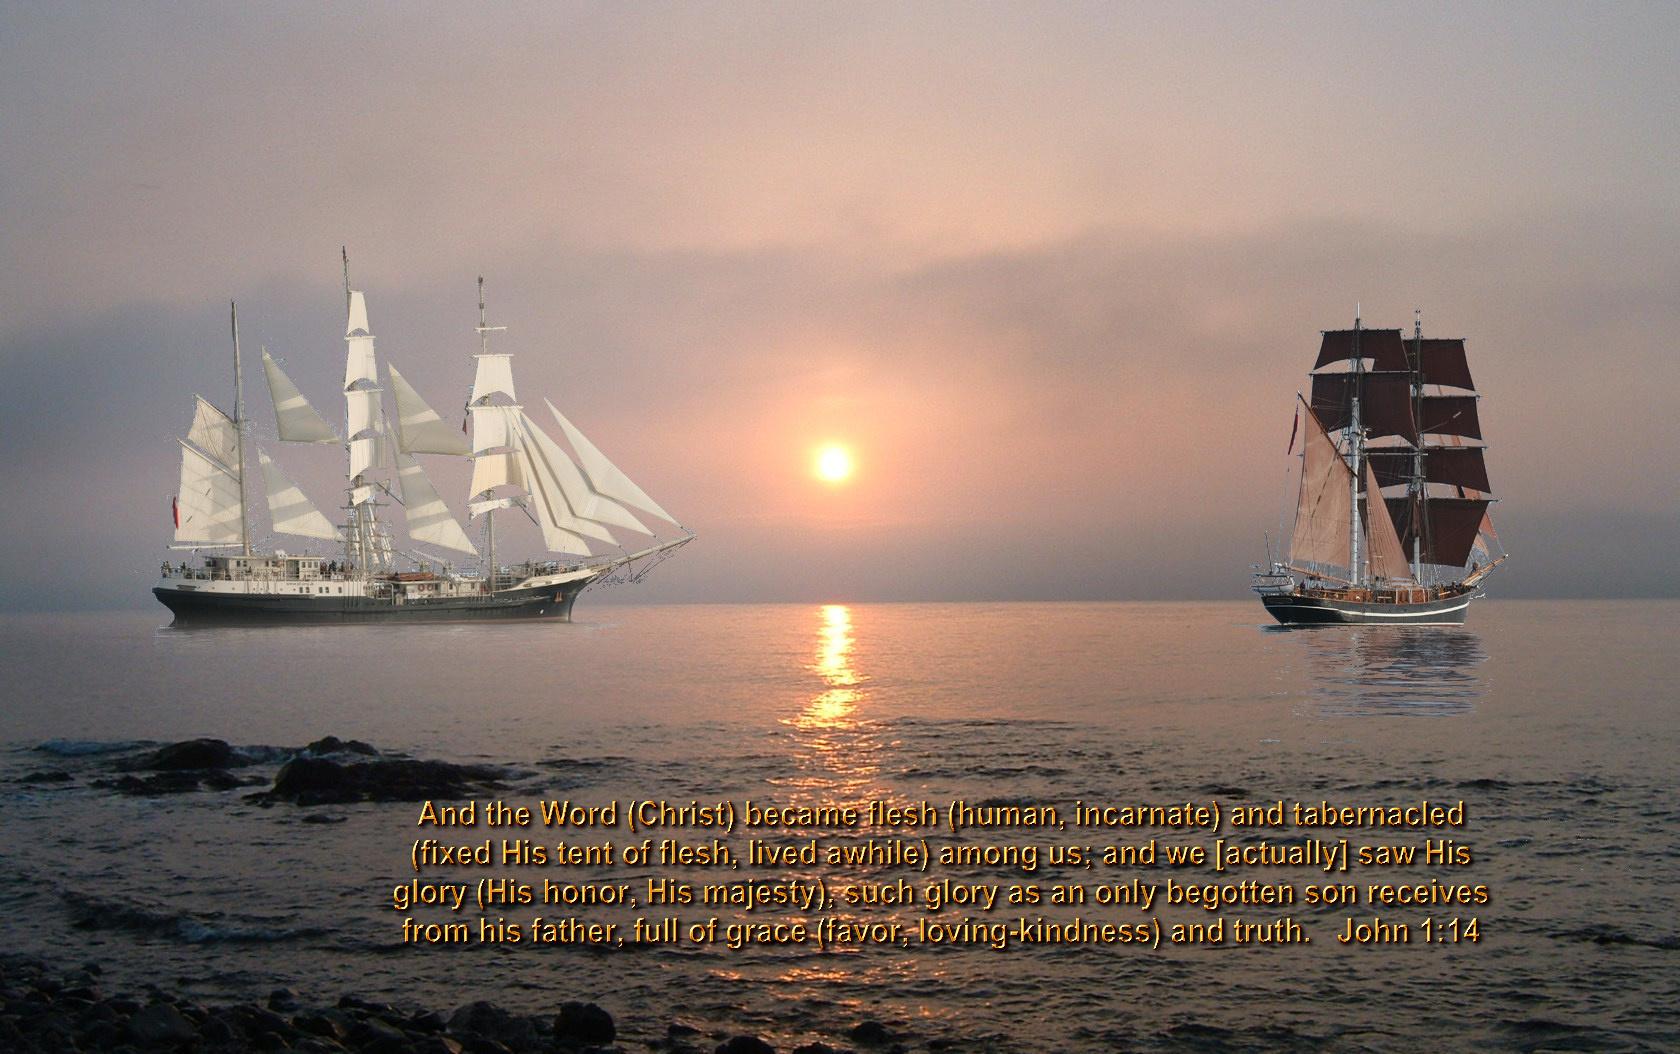 Kjv Bible Verses Wallpaper 1680x1054 pixel Popular HD Wallpaper 1680x1054